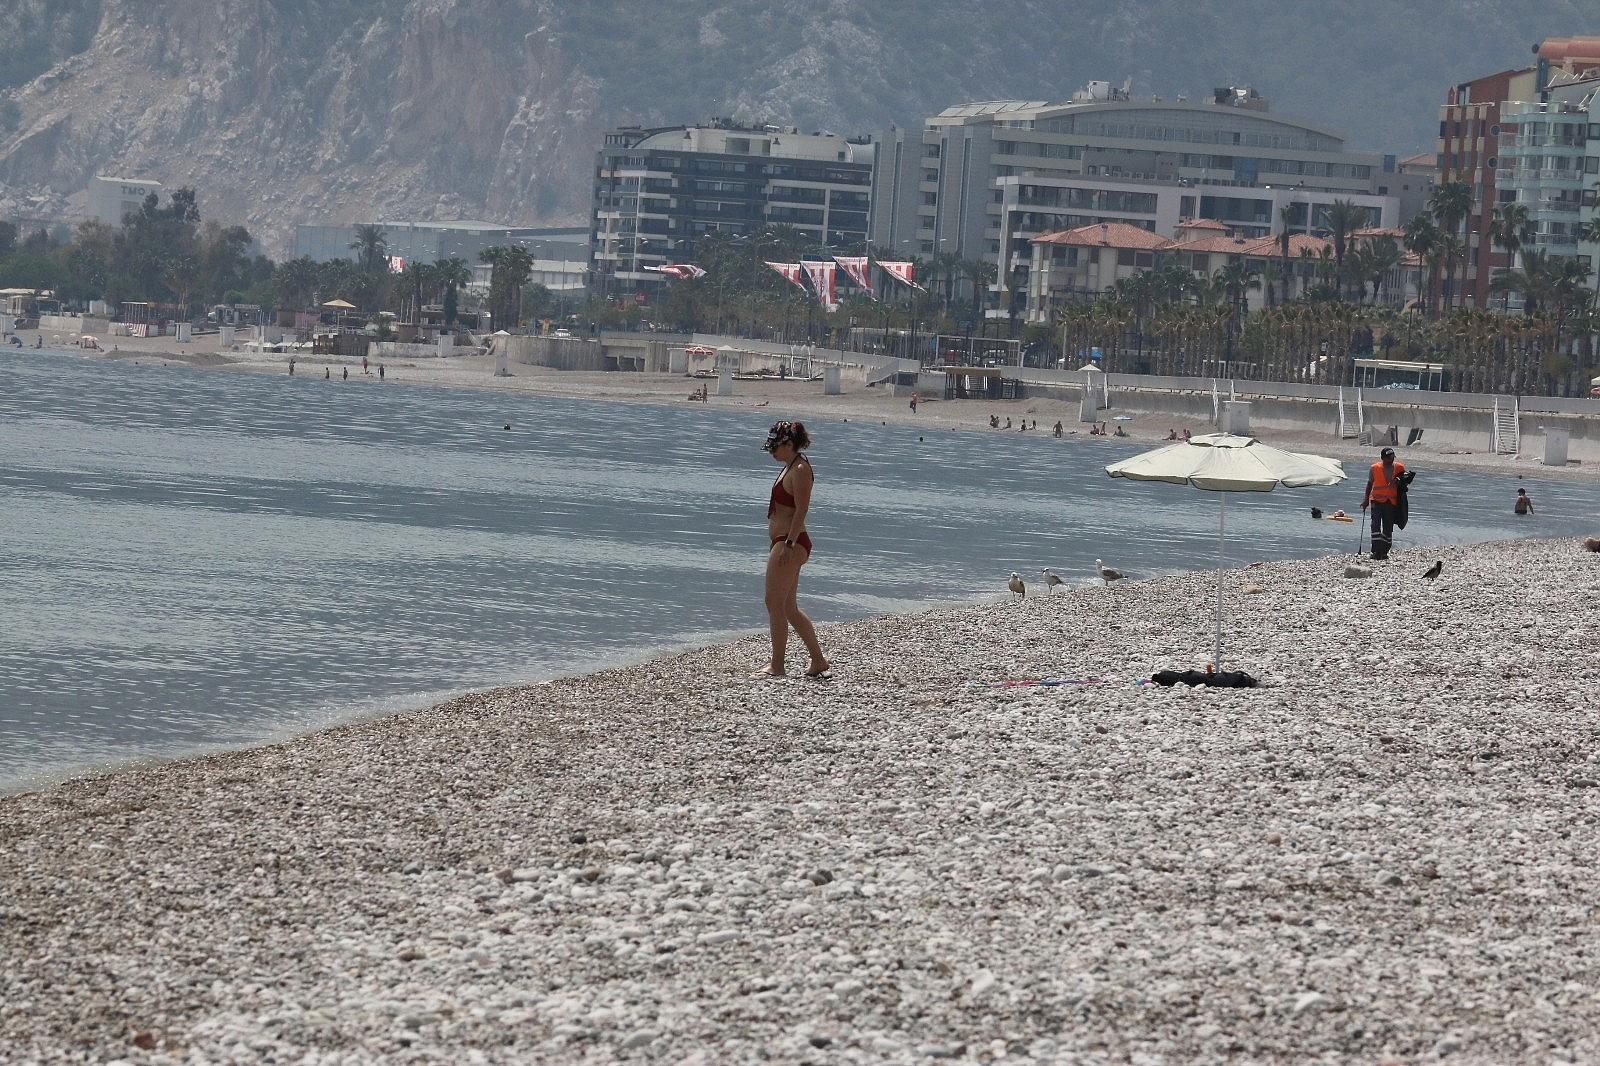 2021/05/dunyaca-unlu-sahilde-sasirtan-manzara-20210502AW31-1.jpg